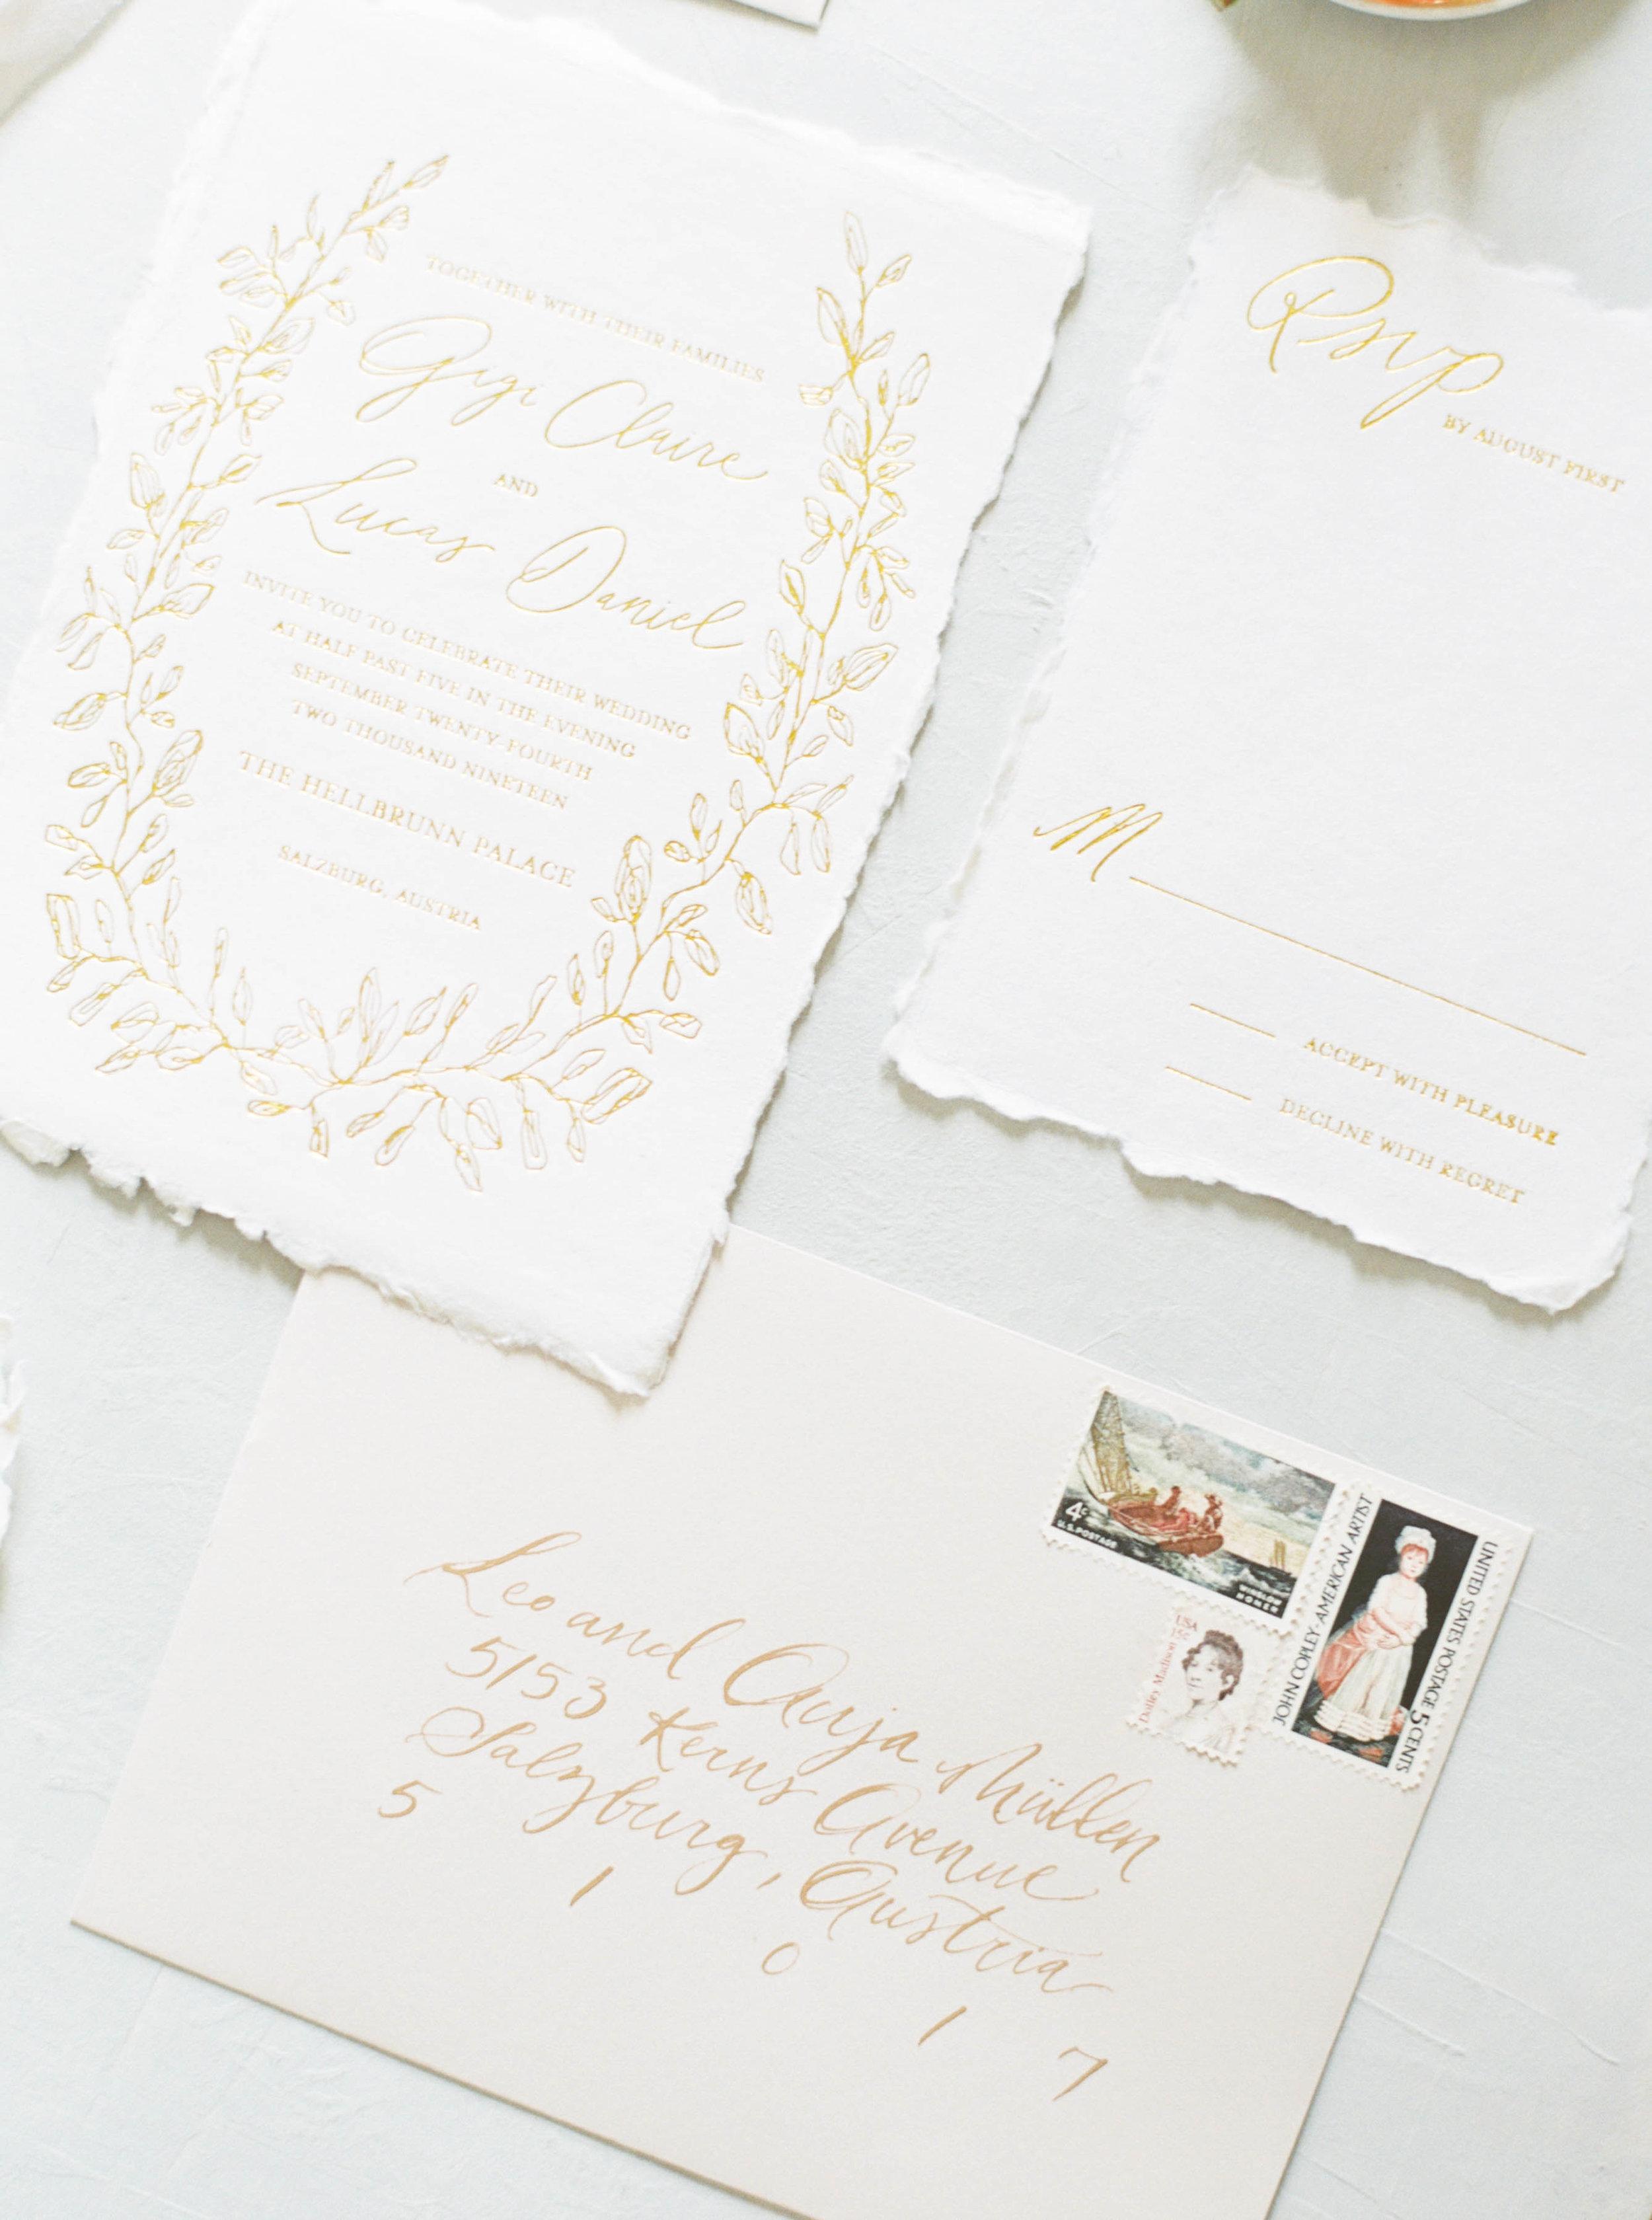 ink&pressco-mikylamanu-wedding-calligraphy-6-unearthing.tc.jpg